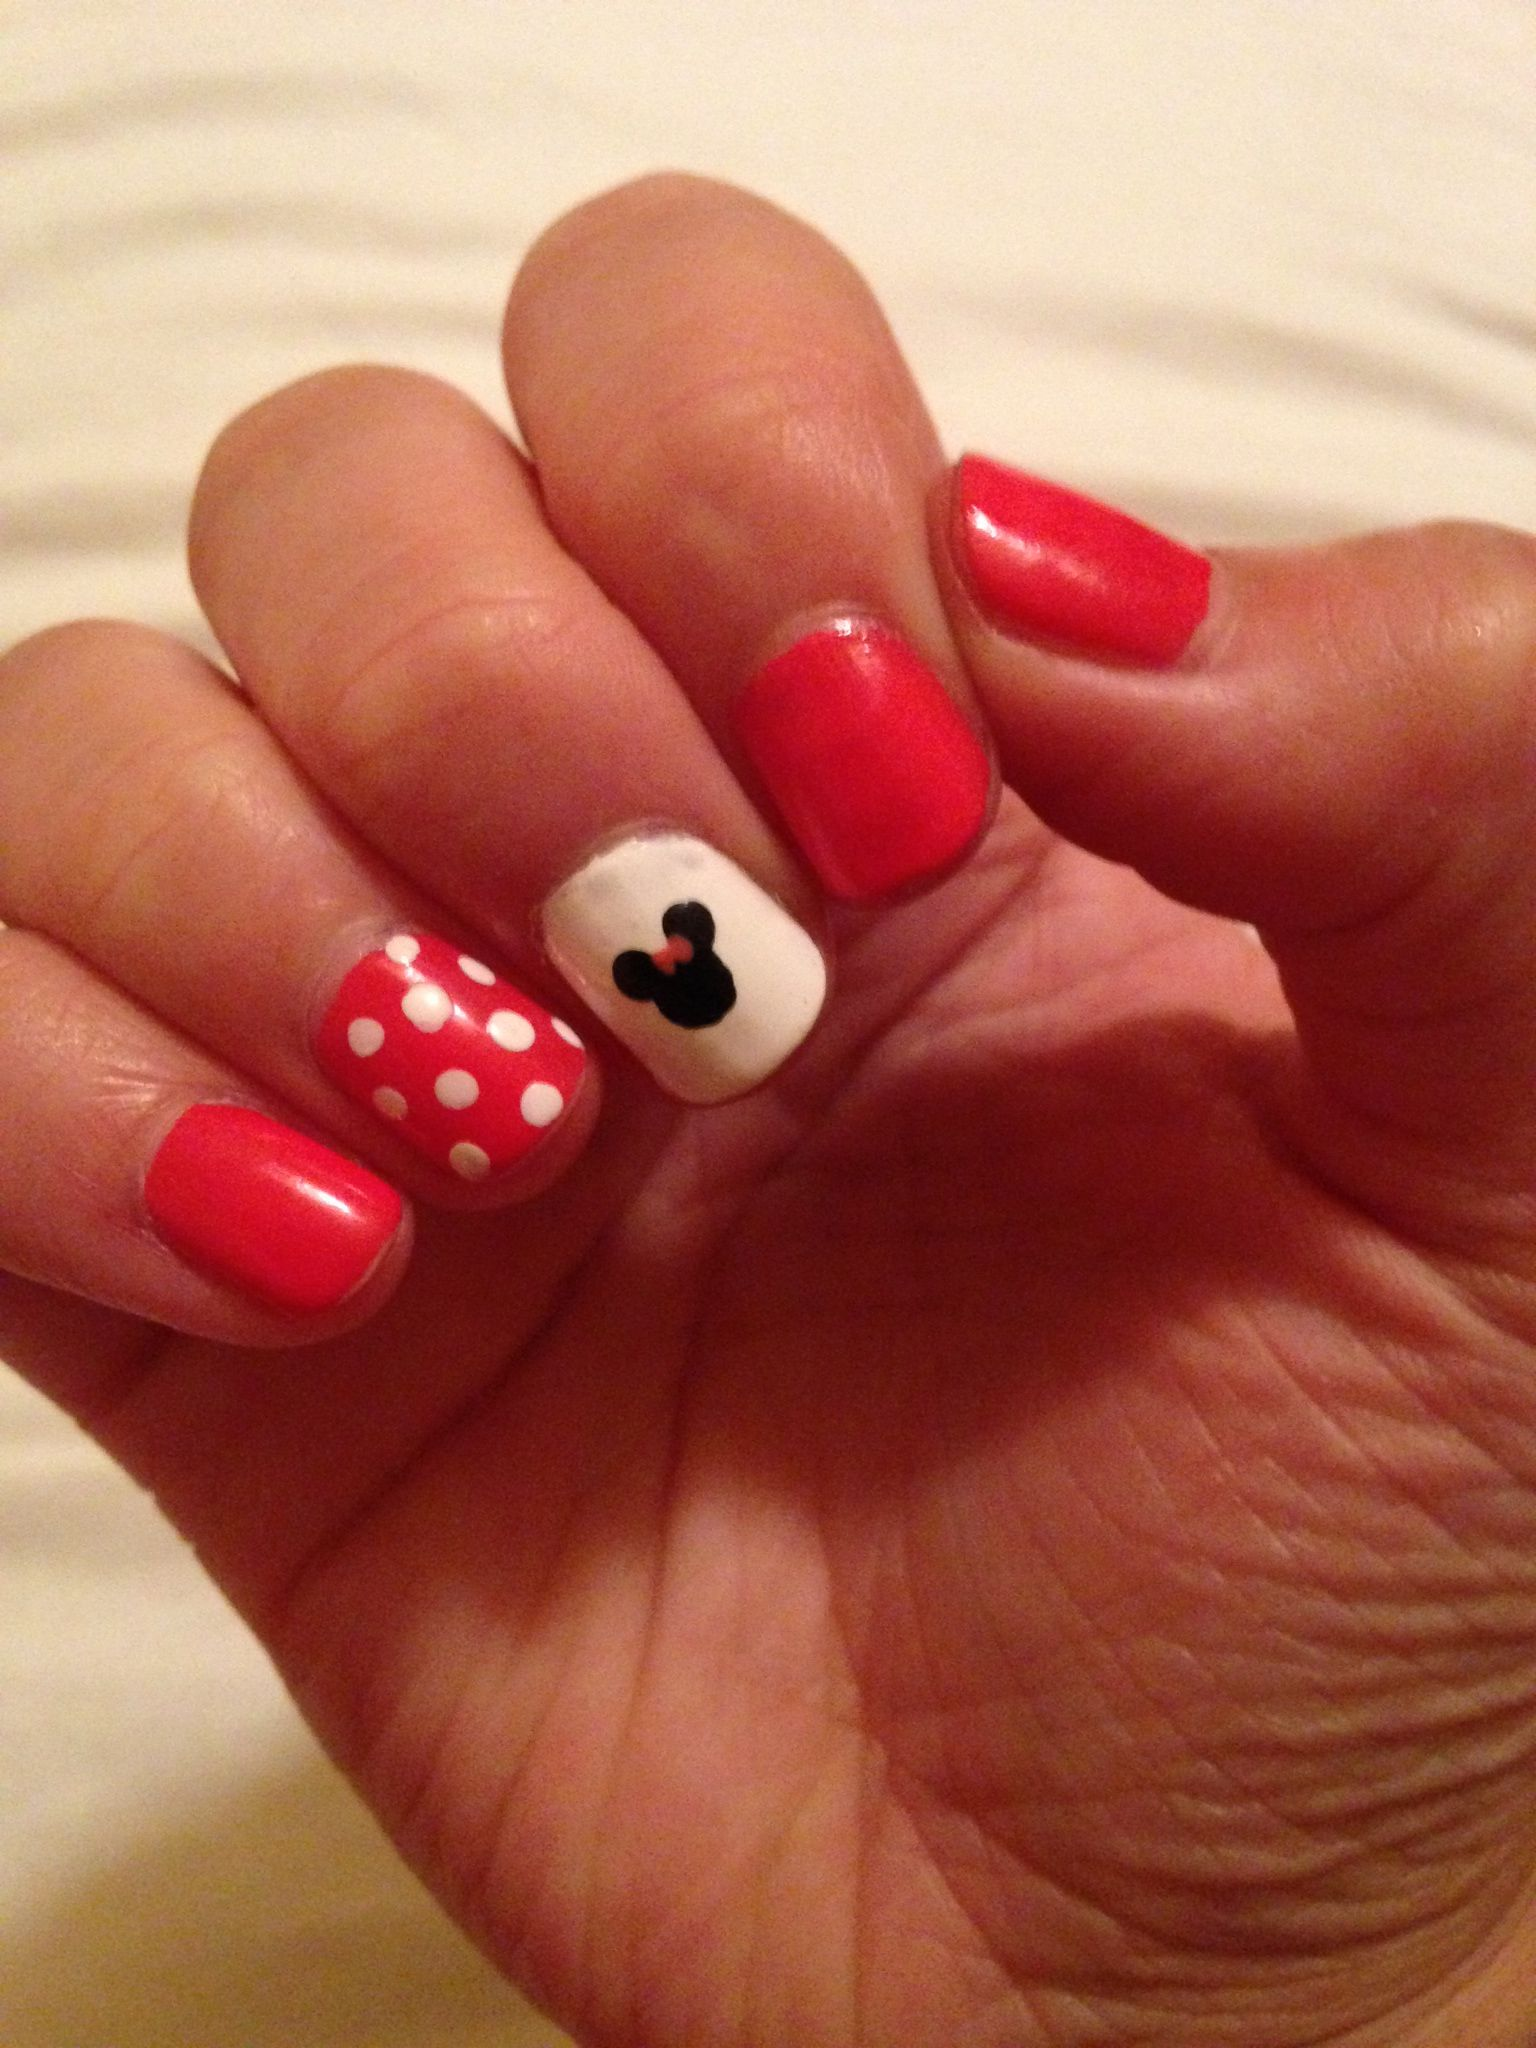 Minnie Mouse nails! Hot pink polka dot   Disney Stuff :)   Pinterest